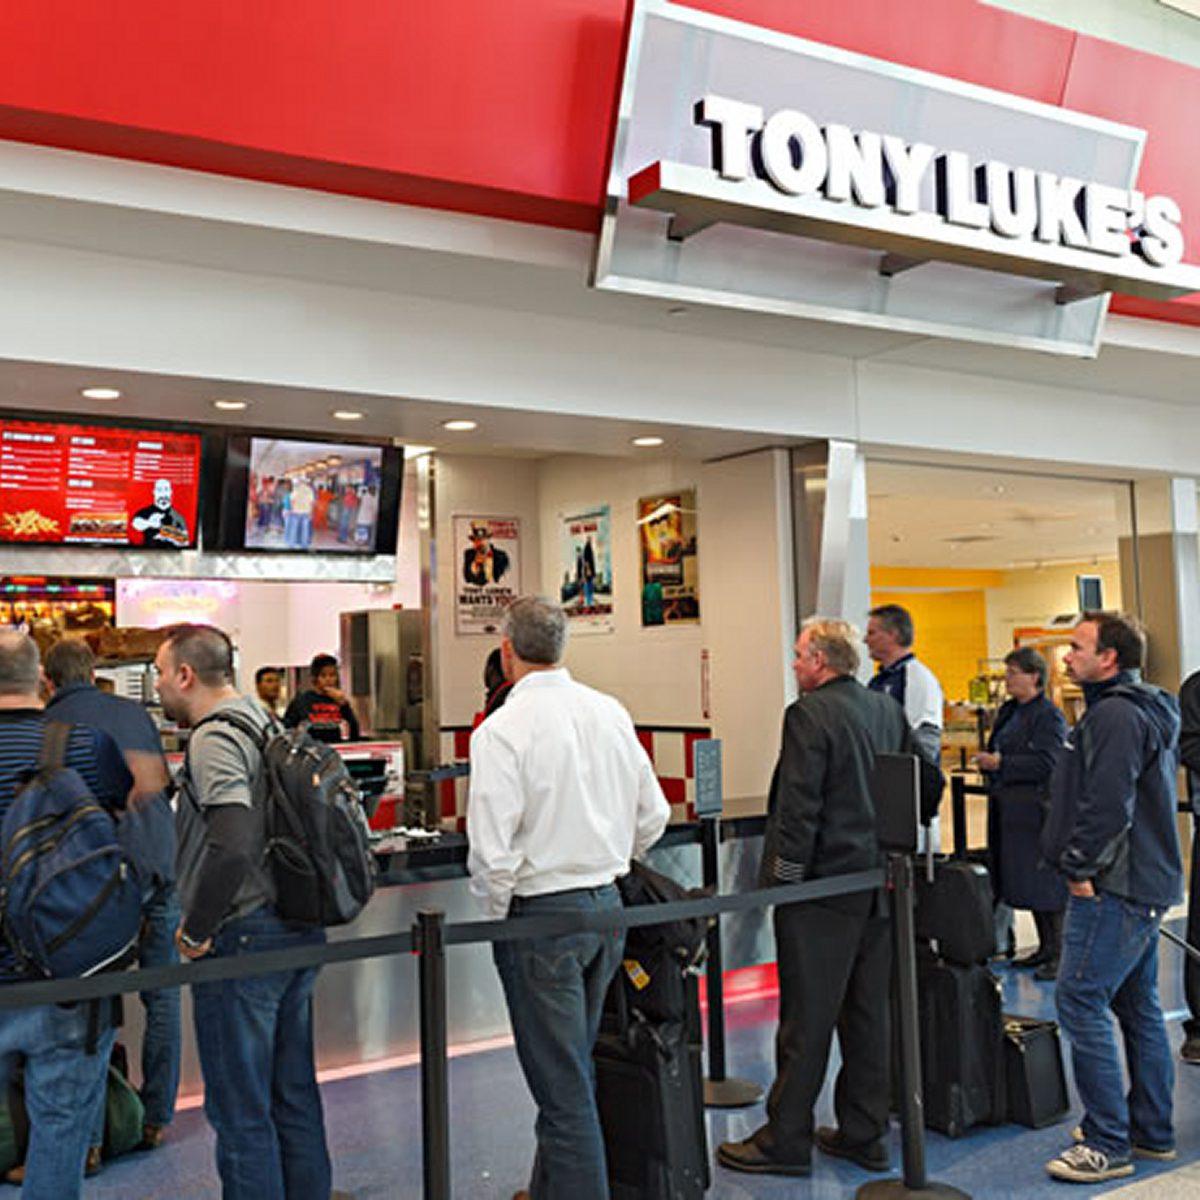 best airport restaurants tony luke's